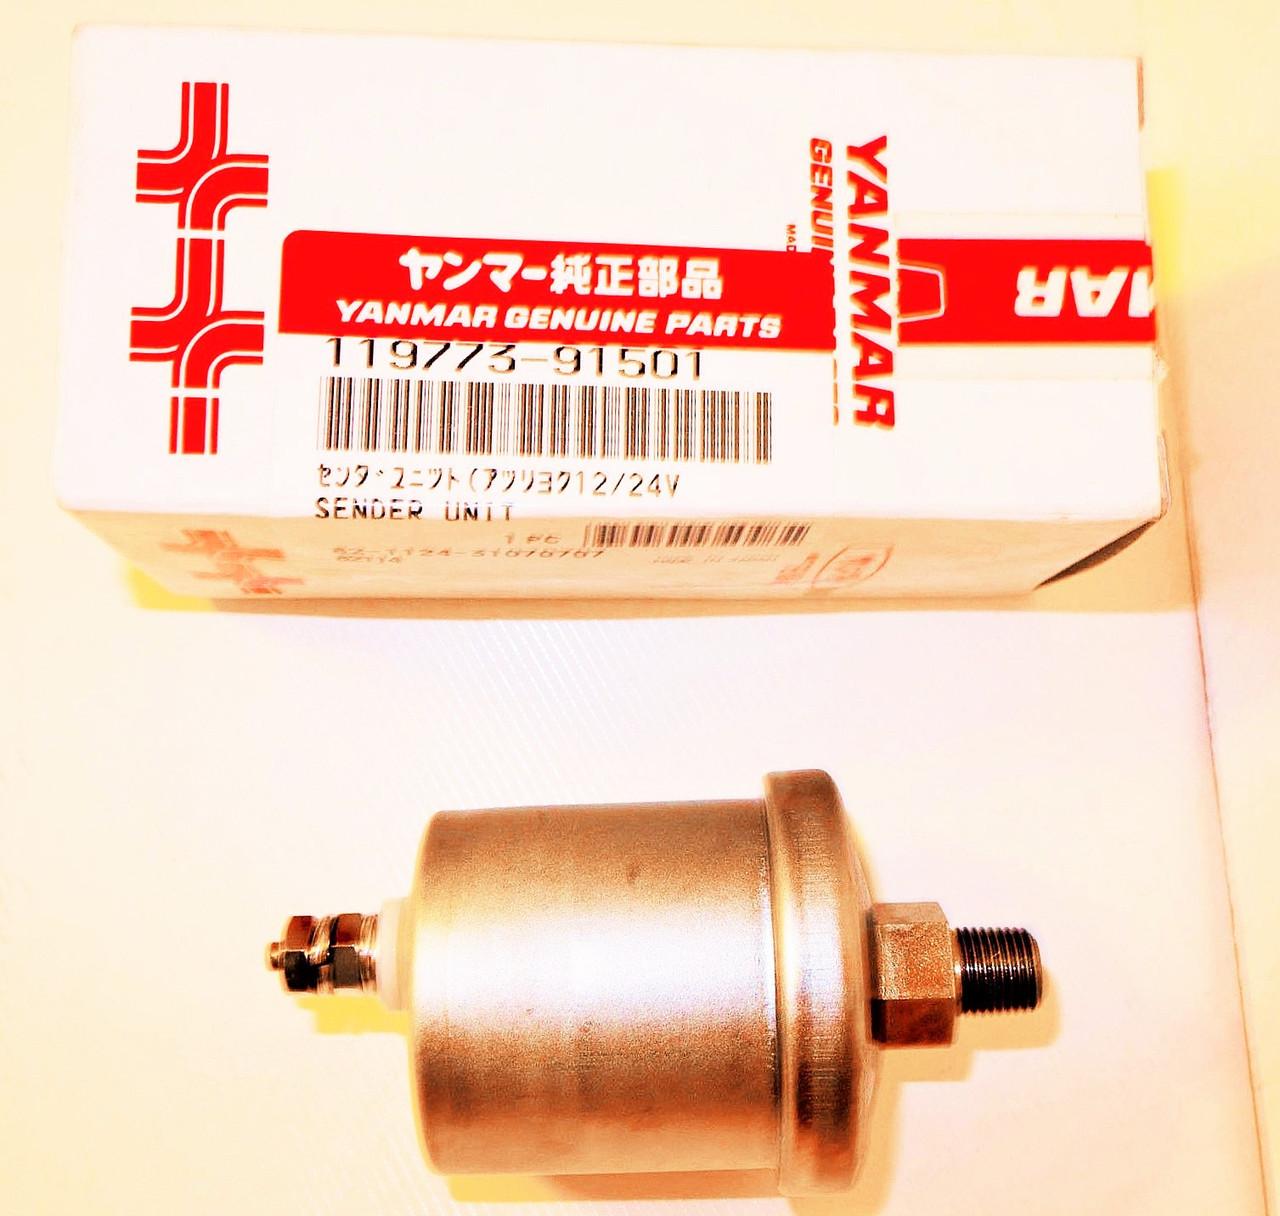 Датчик тиску масла Yanmar 119773-915001